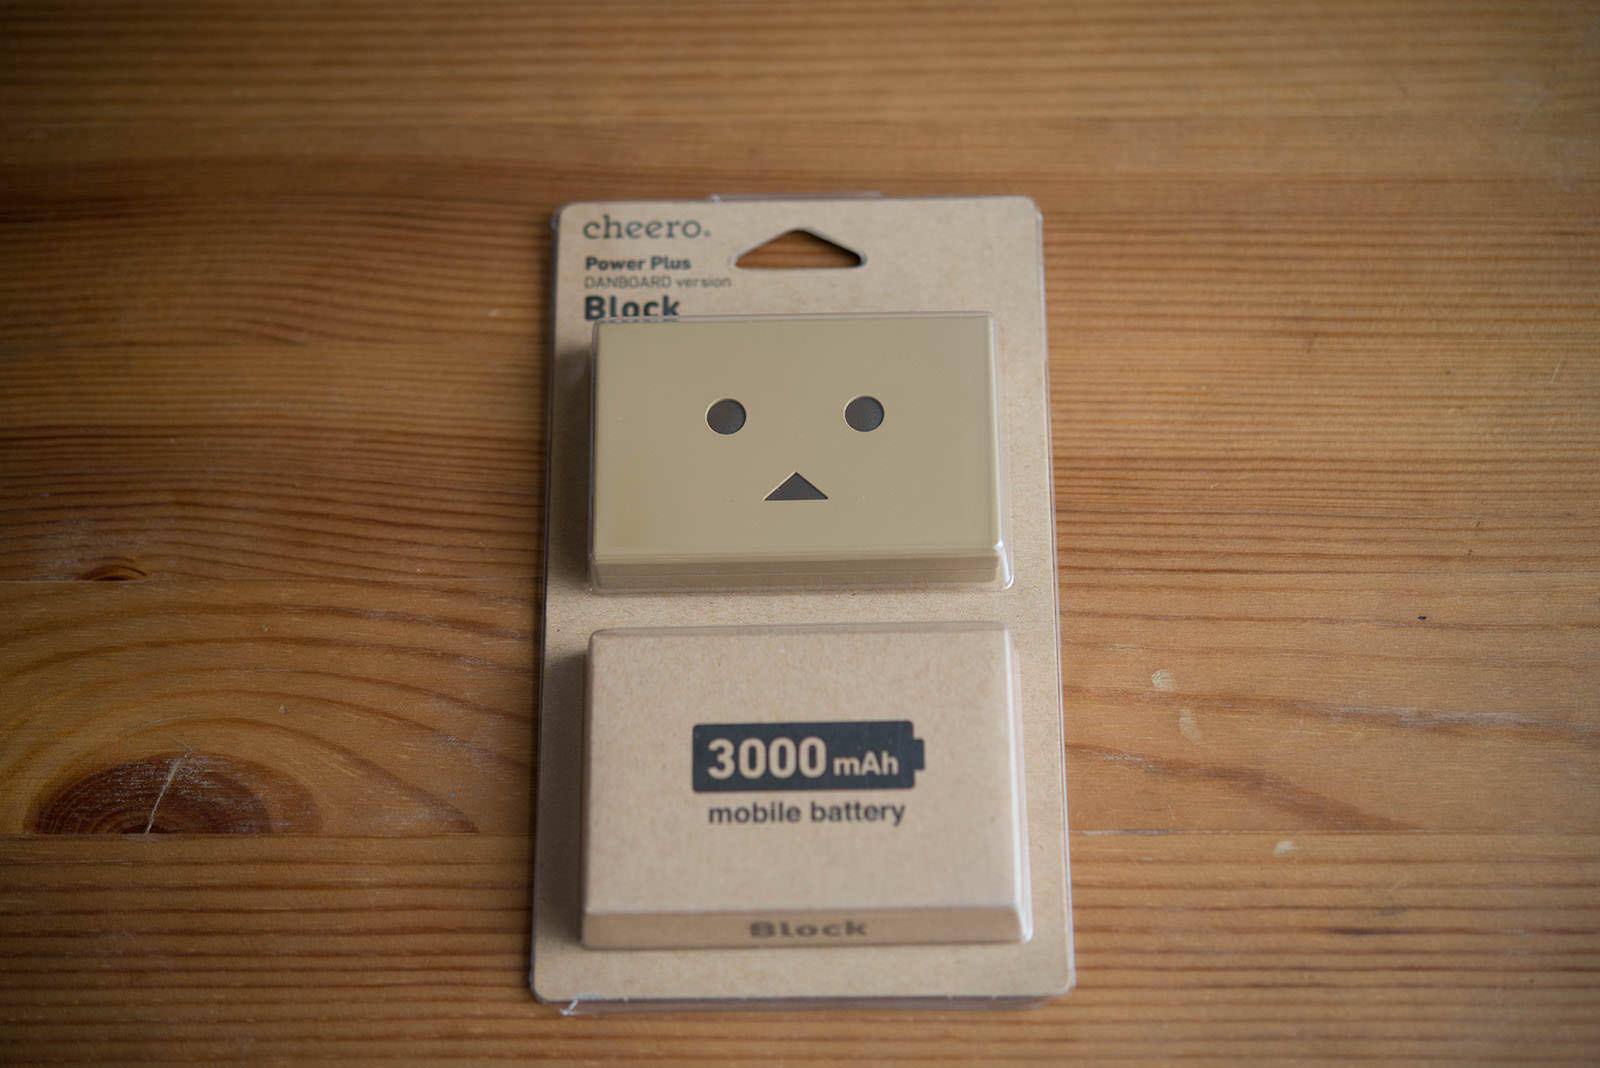 cheero Power Plus DANBOARD version block review_01